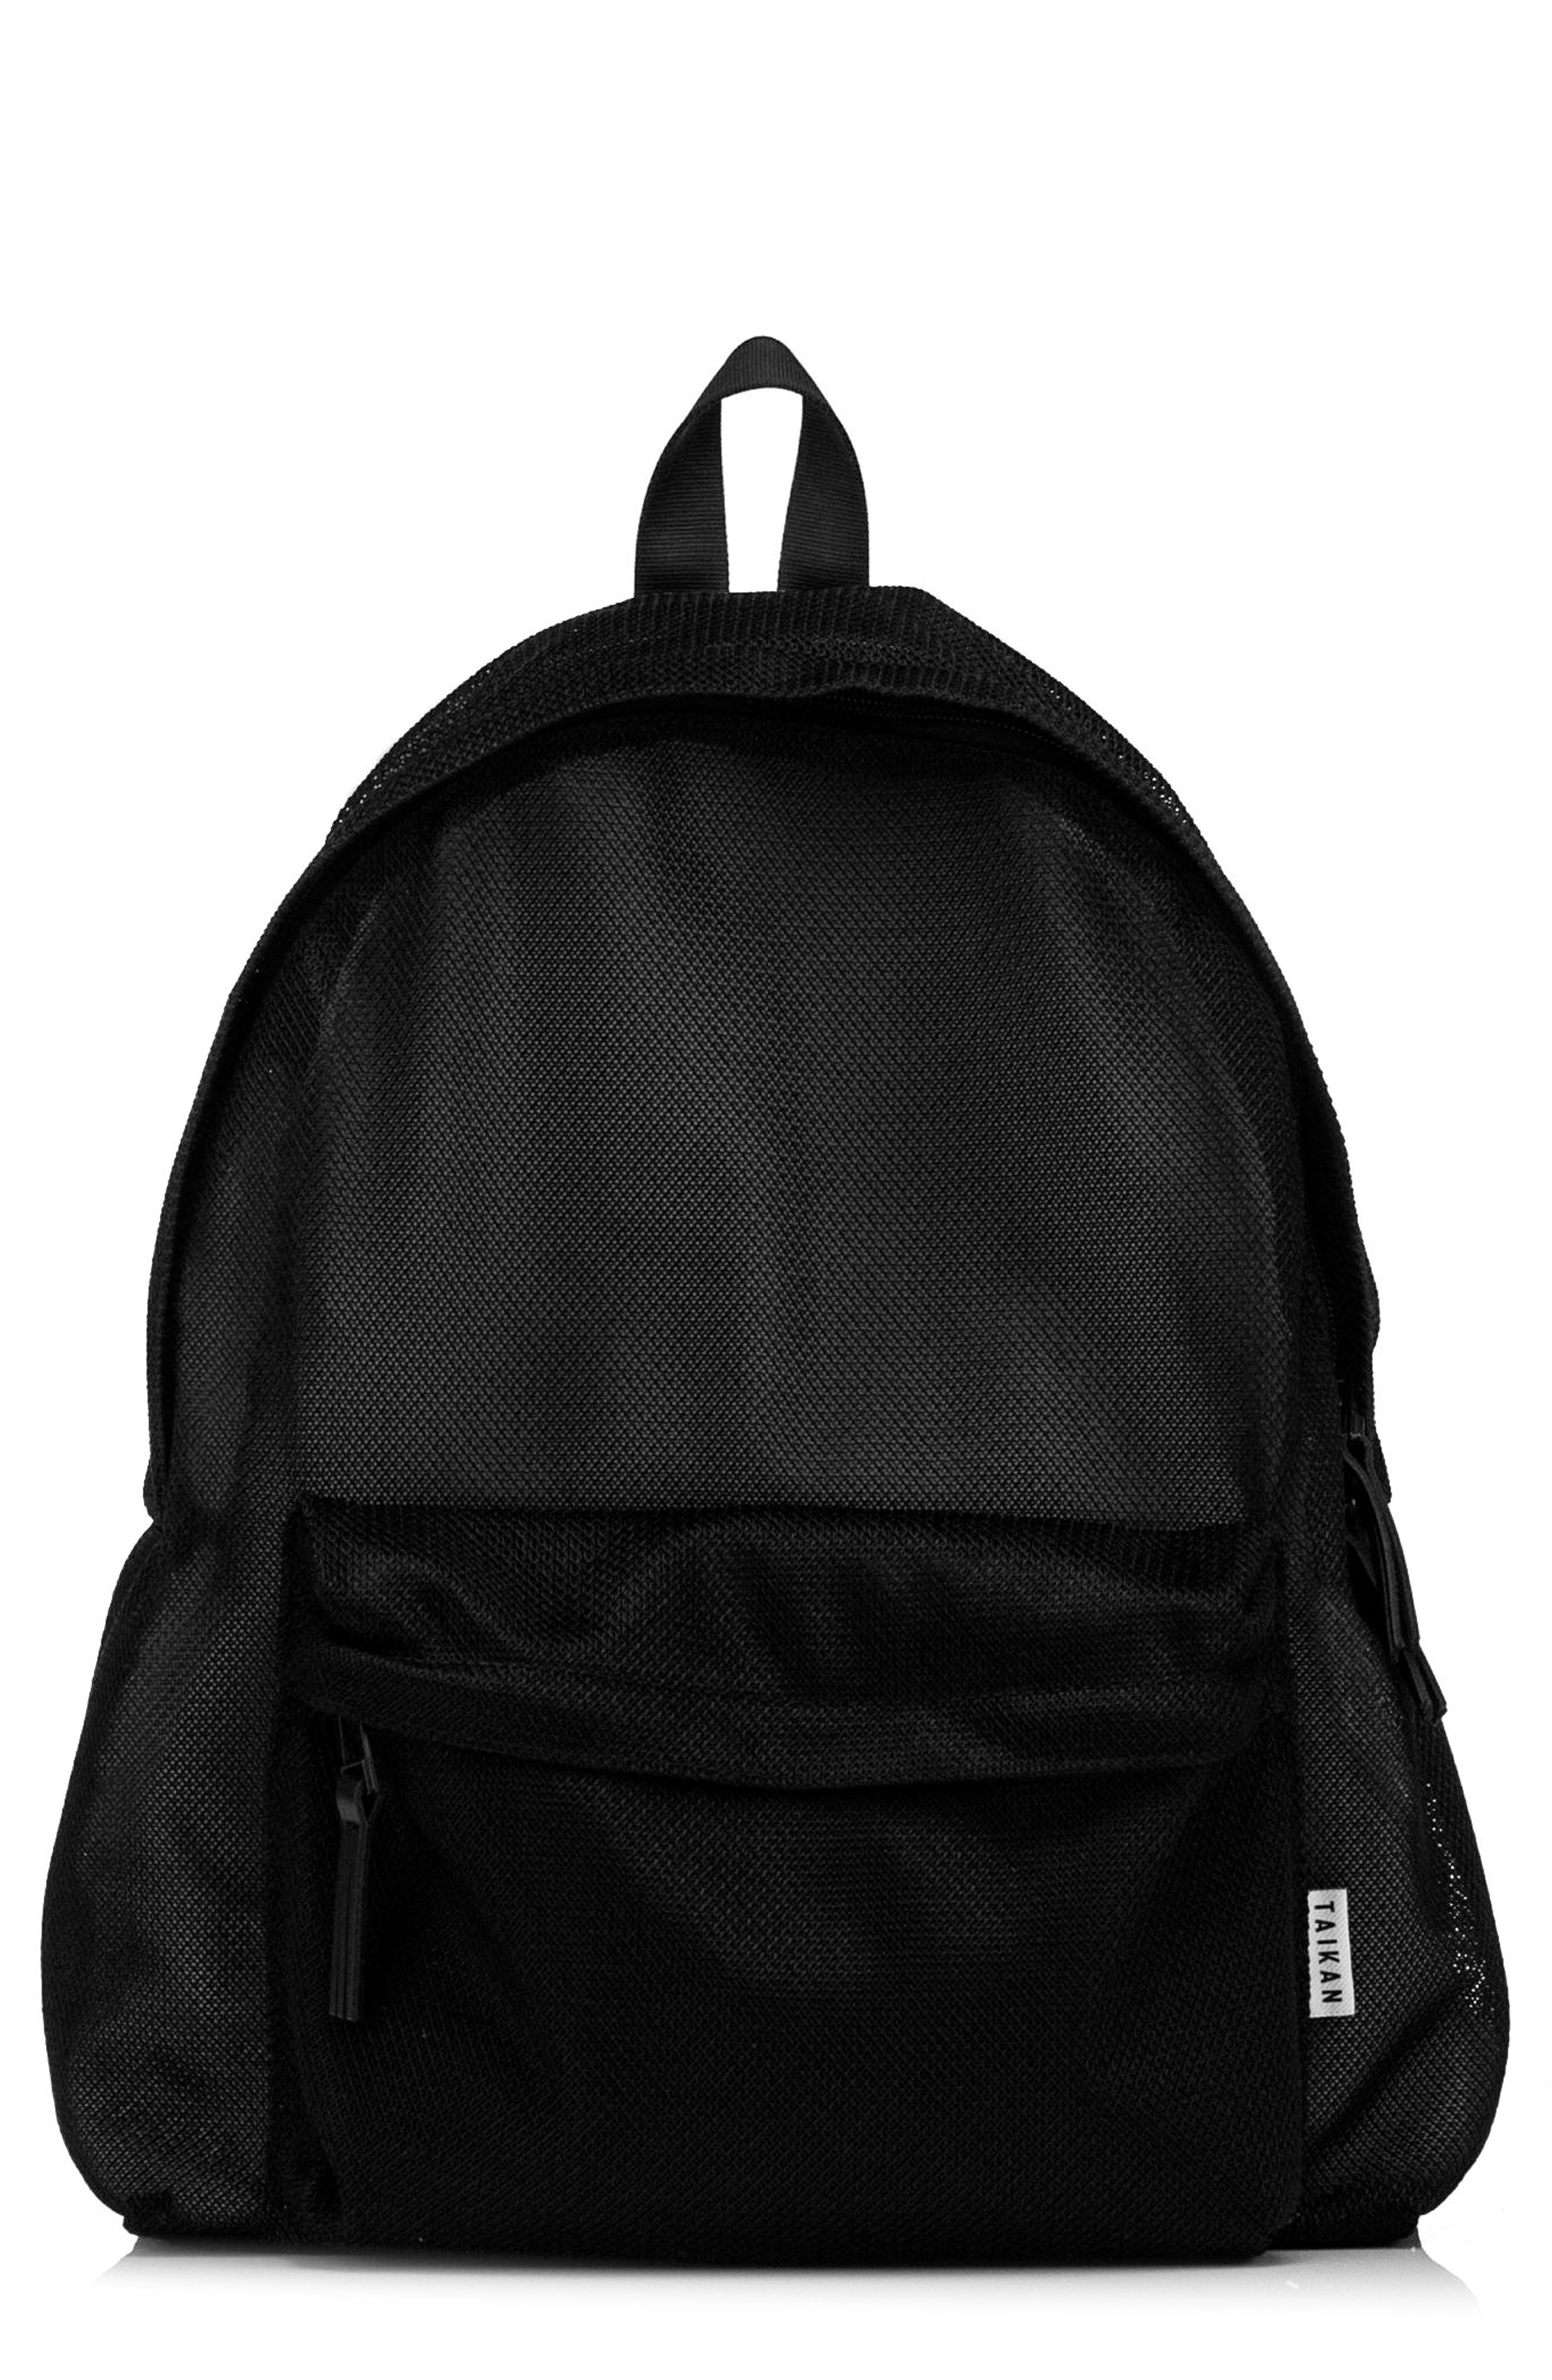 TAIKAN Hornet Mesh Backpack, Main, color, 003